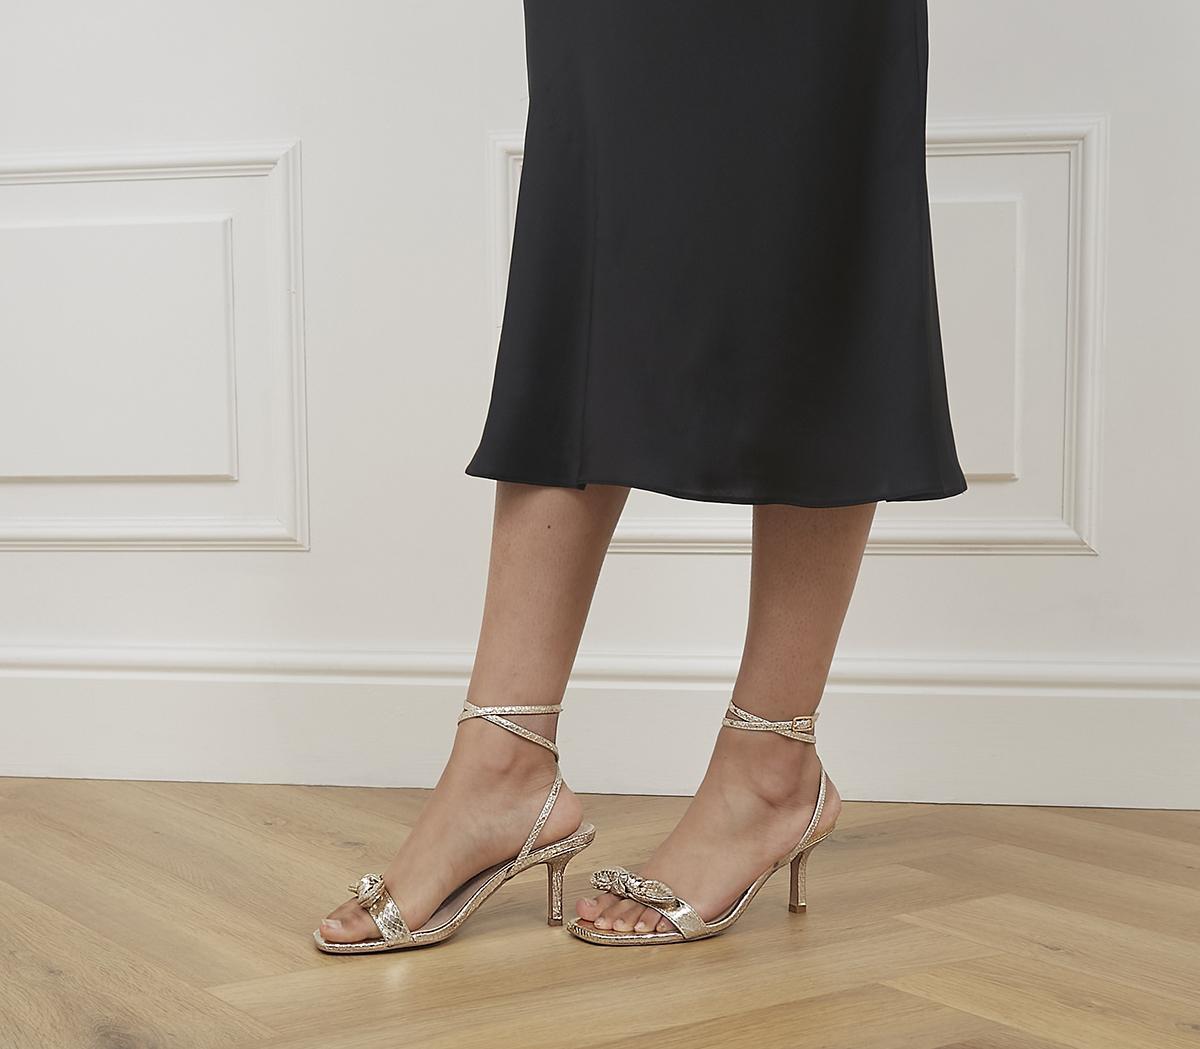 Membership Bow Stiletto Heels